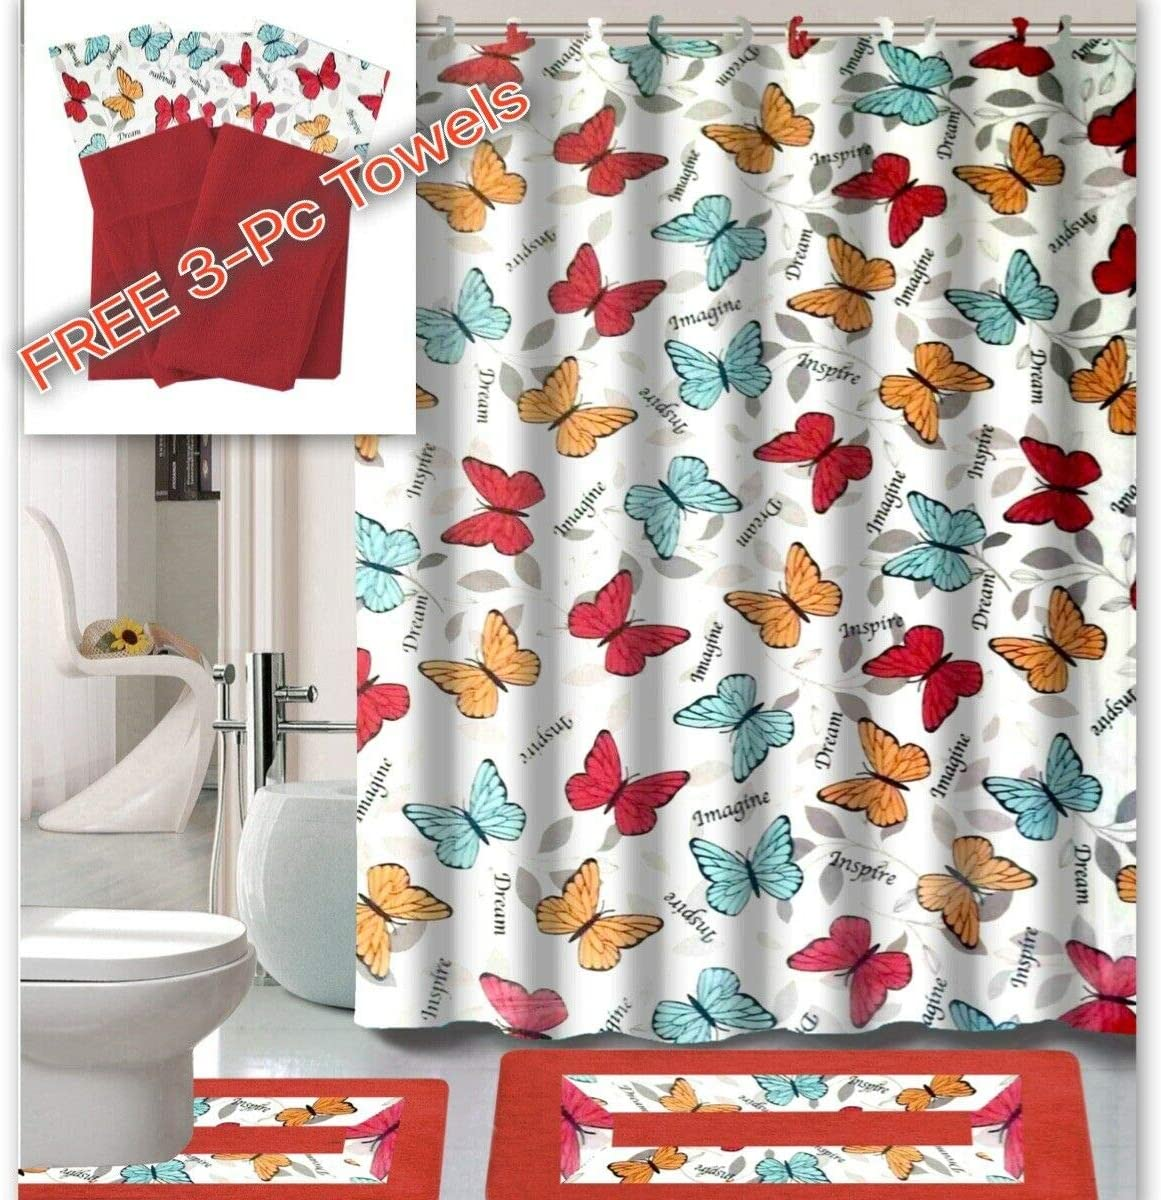 Empire Home 5 Piece Elegant Bathroom Set Bath Rugs Shower Curtain Hooks +  Free 5 Piece Towel Set (Butterfly Red)